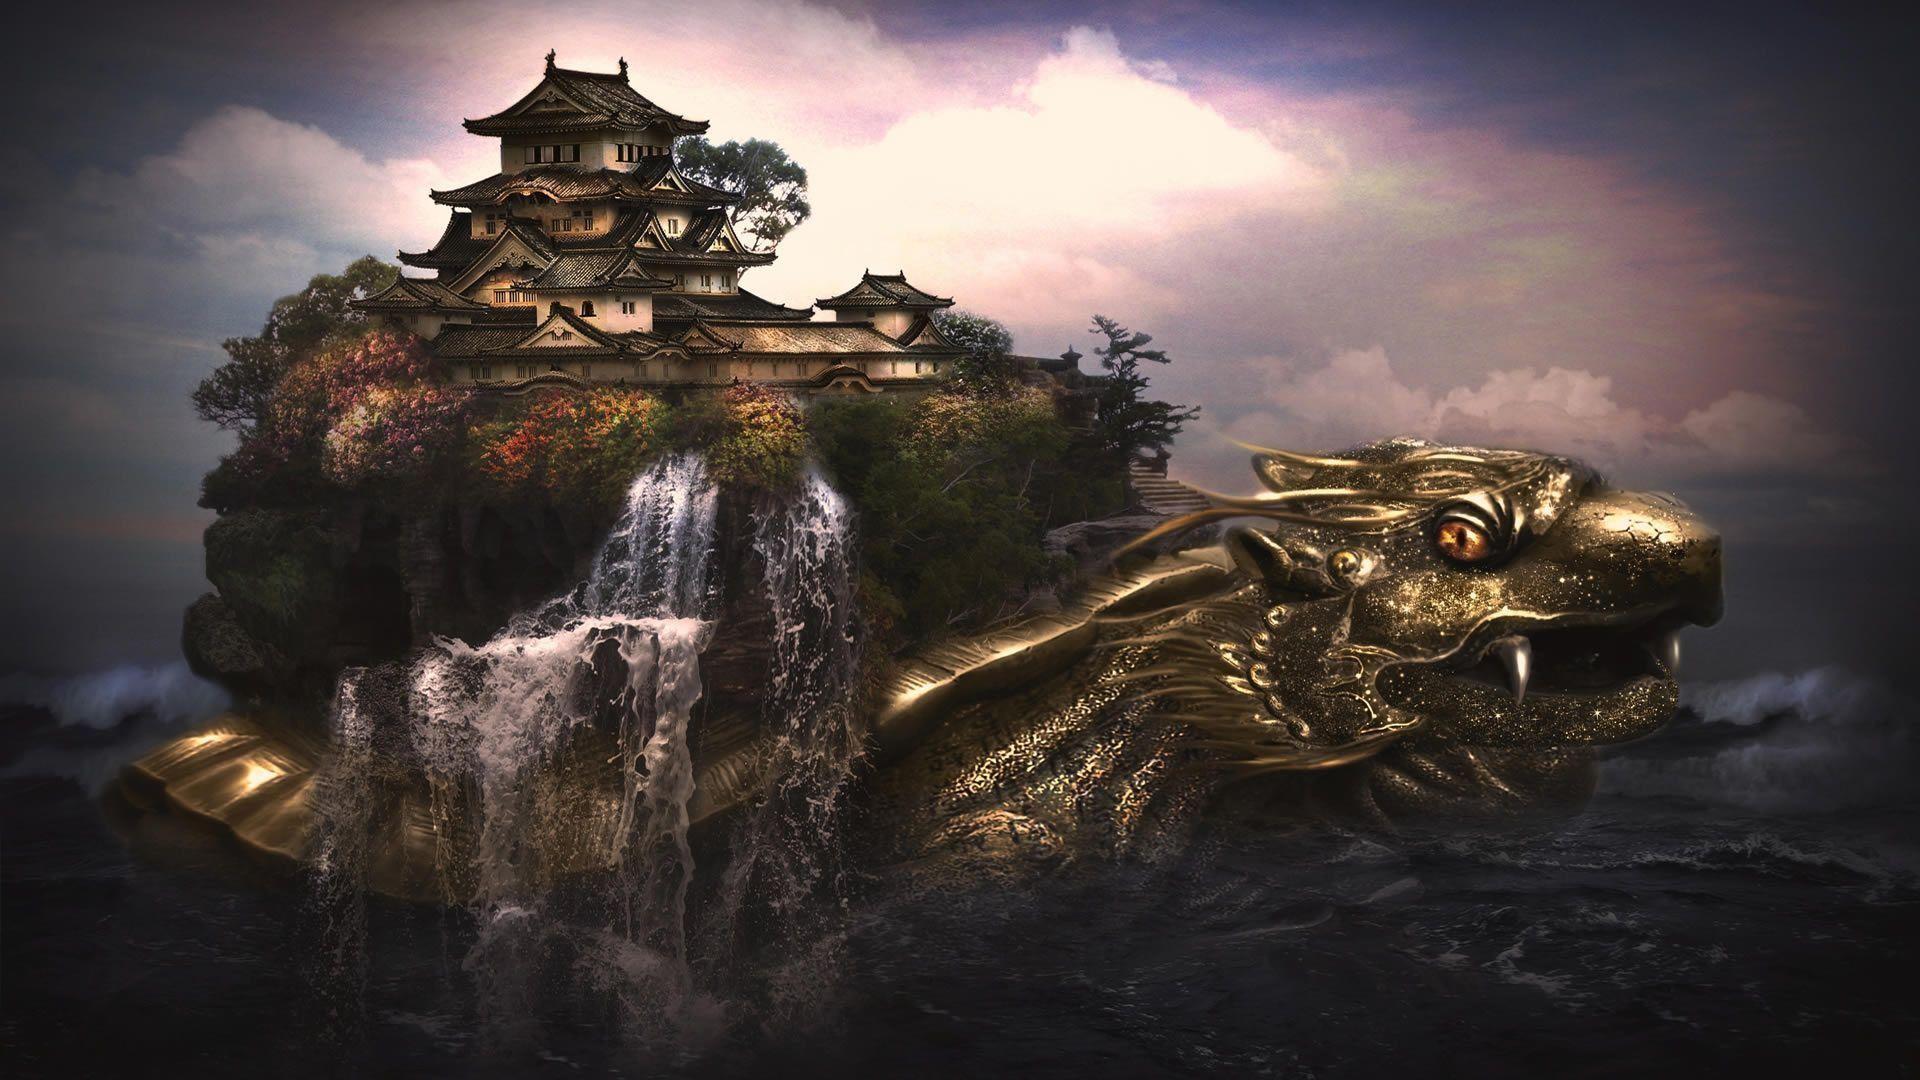 … fantasy wallpapers image wallpaper cave; fantasy wallpapers hd …